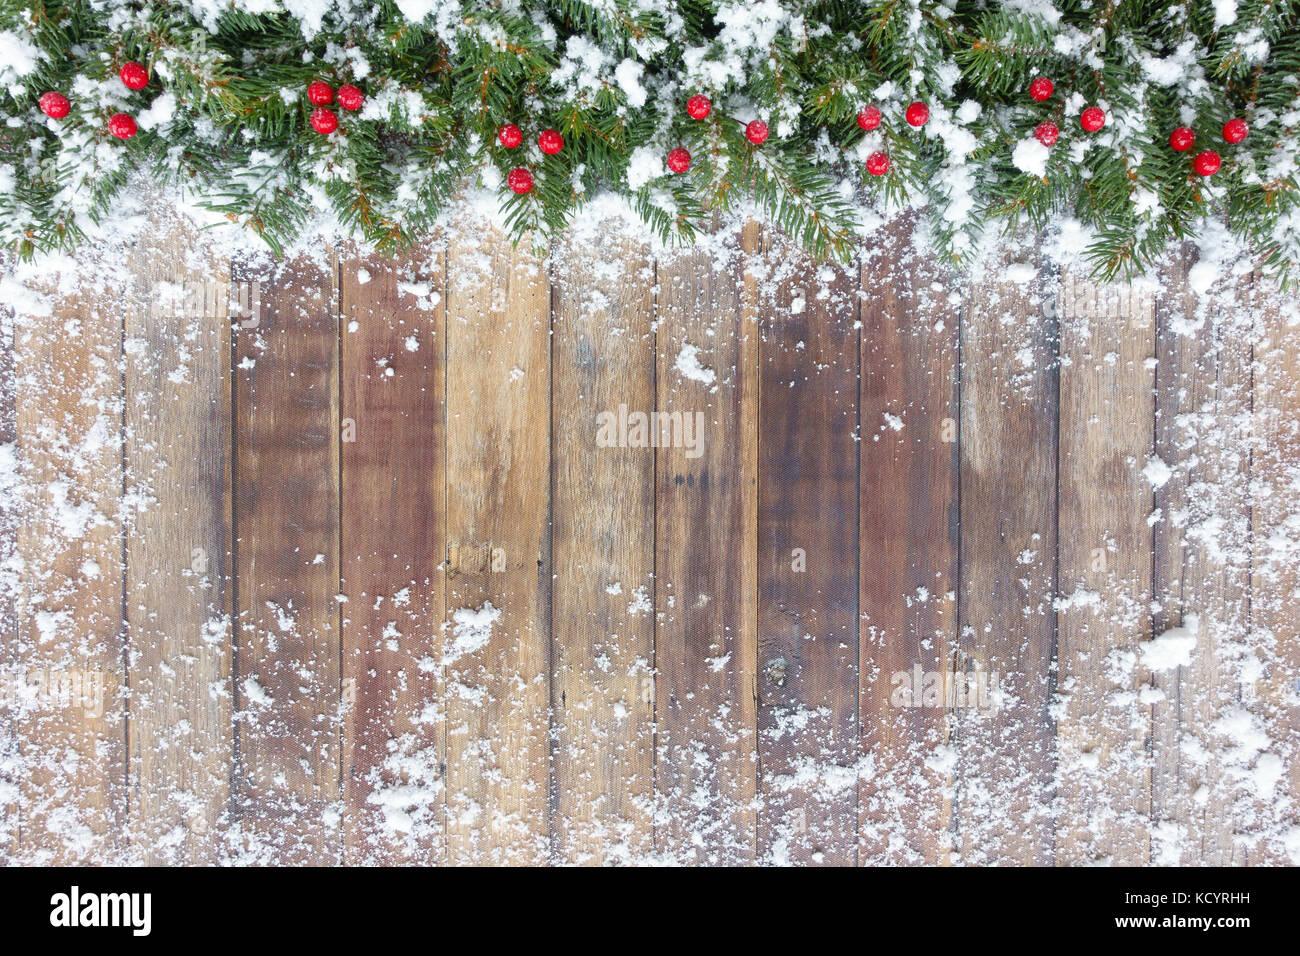 Laurel Christmas Tree